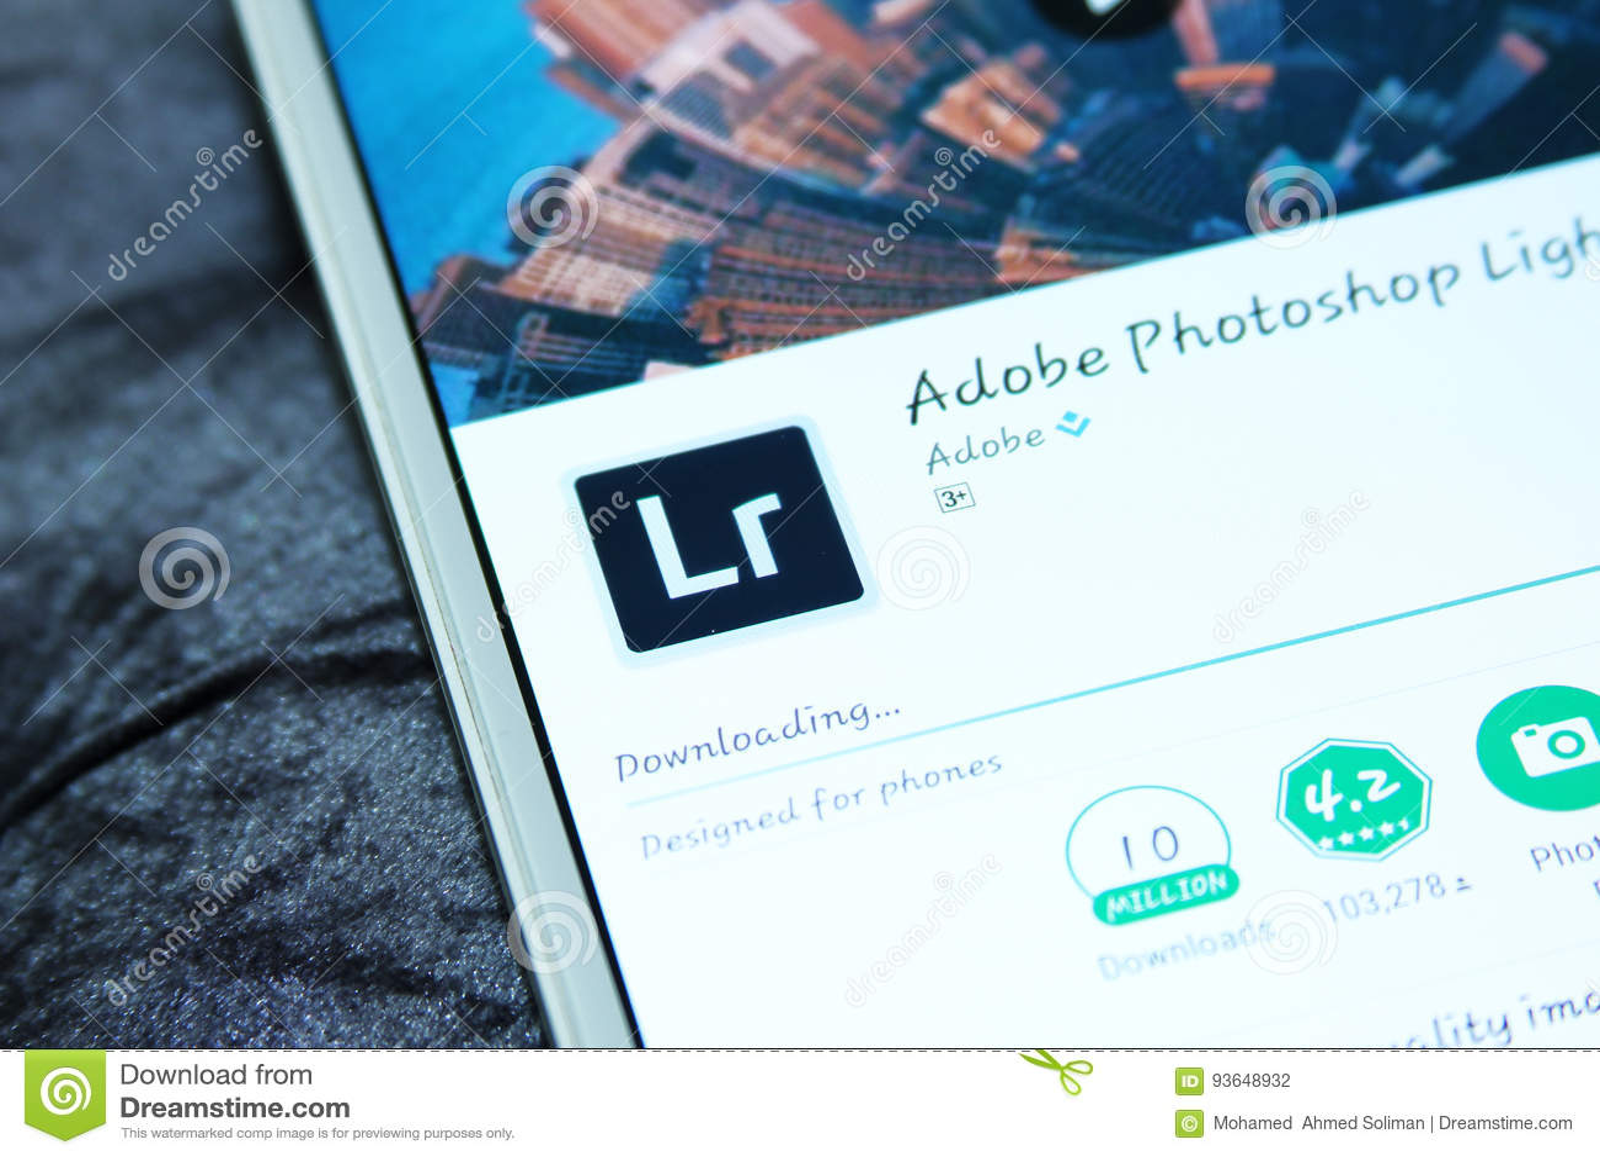 Adobe Photoshop Lightroom Mobile App Editorial Photography